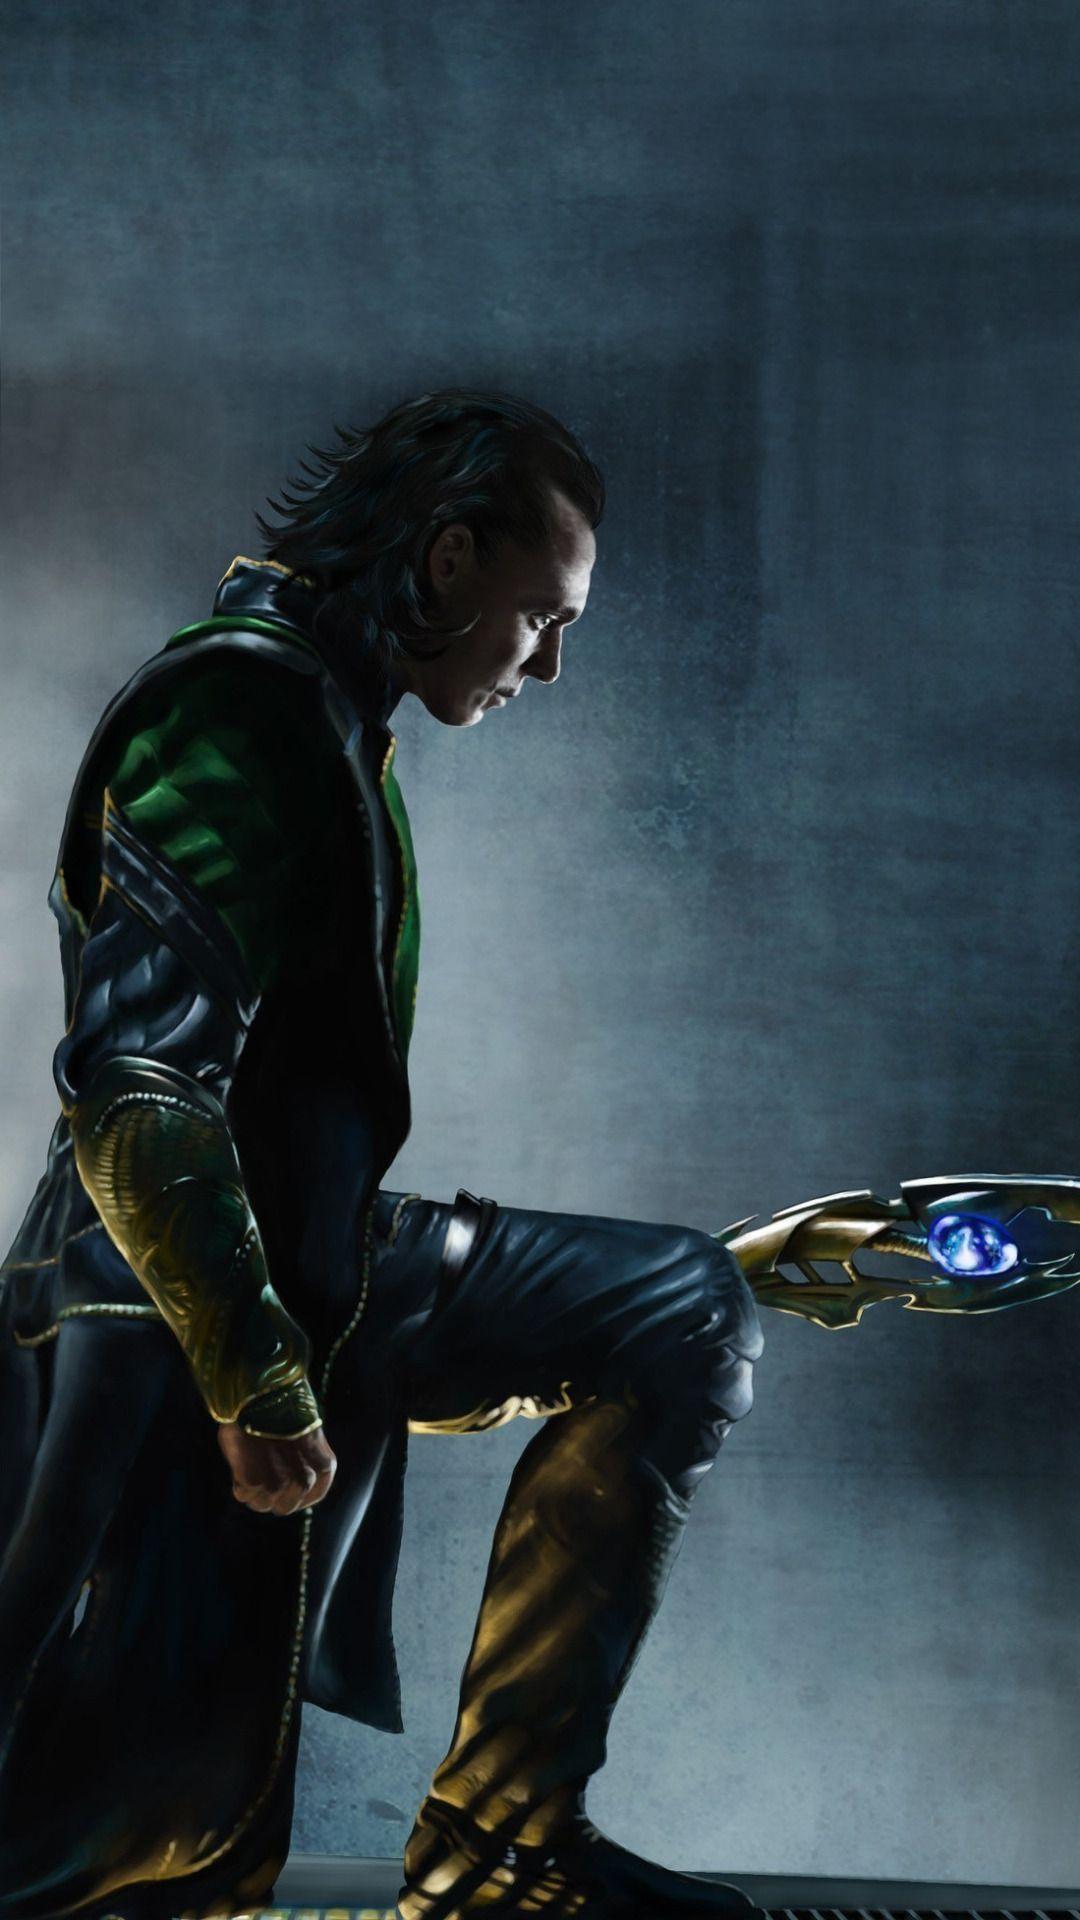 Loki (Tom Hiddleston) Loki wallpaper, Loki laufeyson